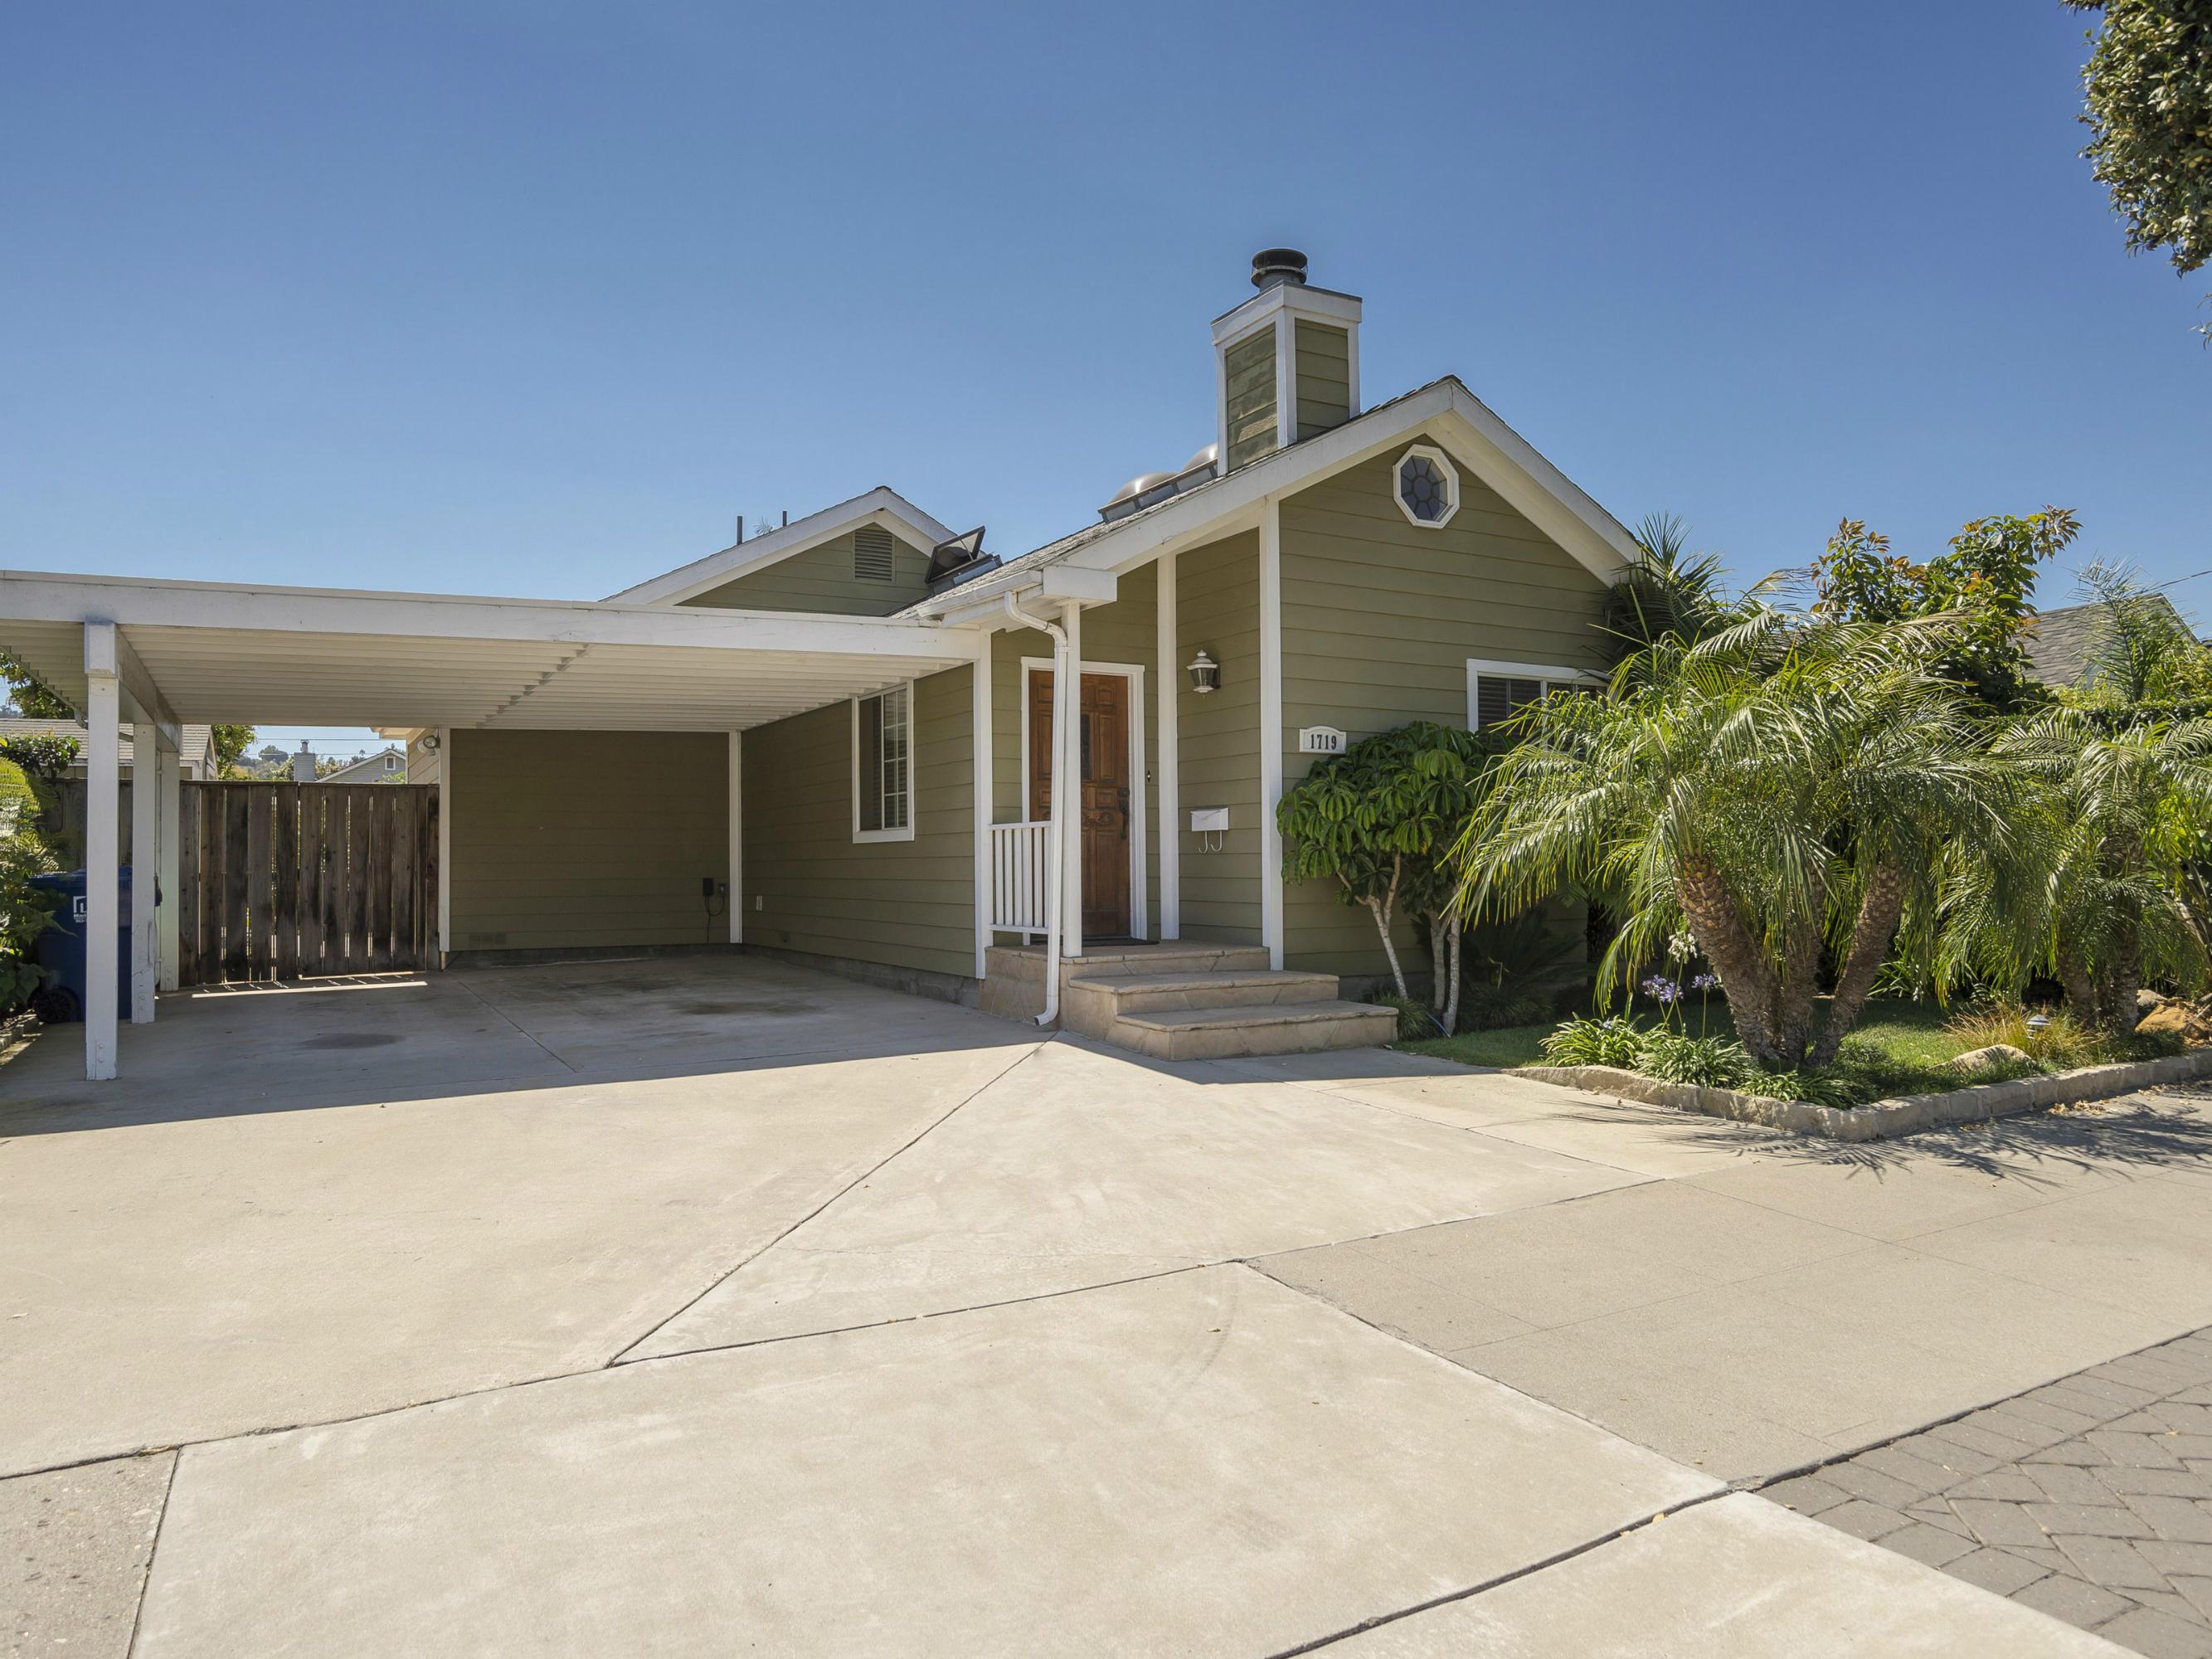 Property photo for 1719 Chino St Santa Barbara, California 93101 - 13-2847